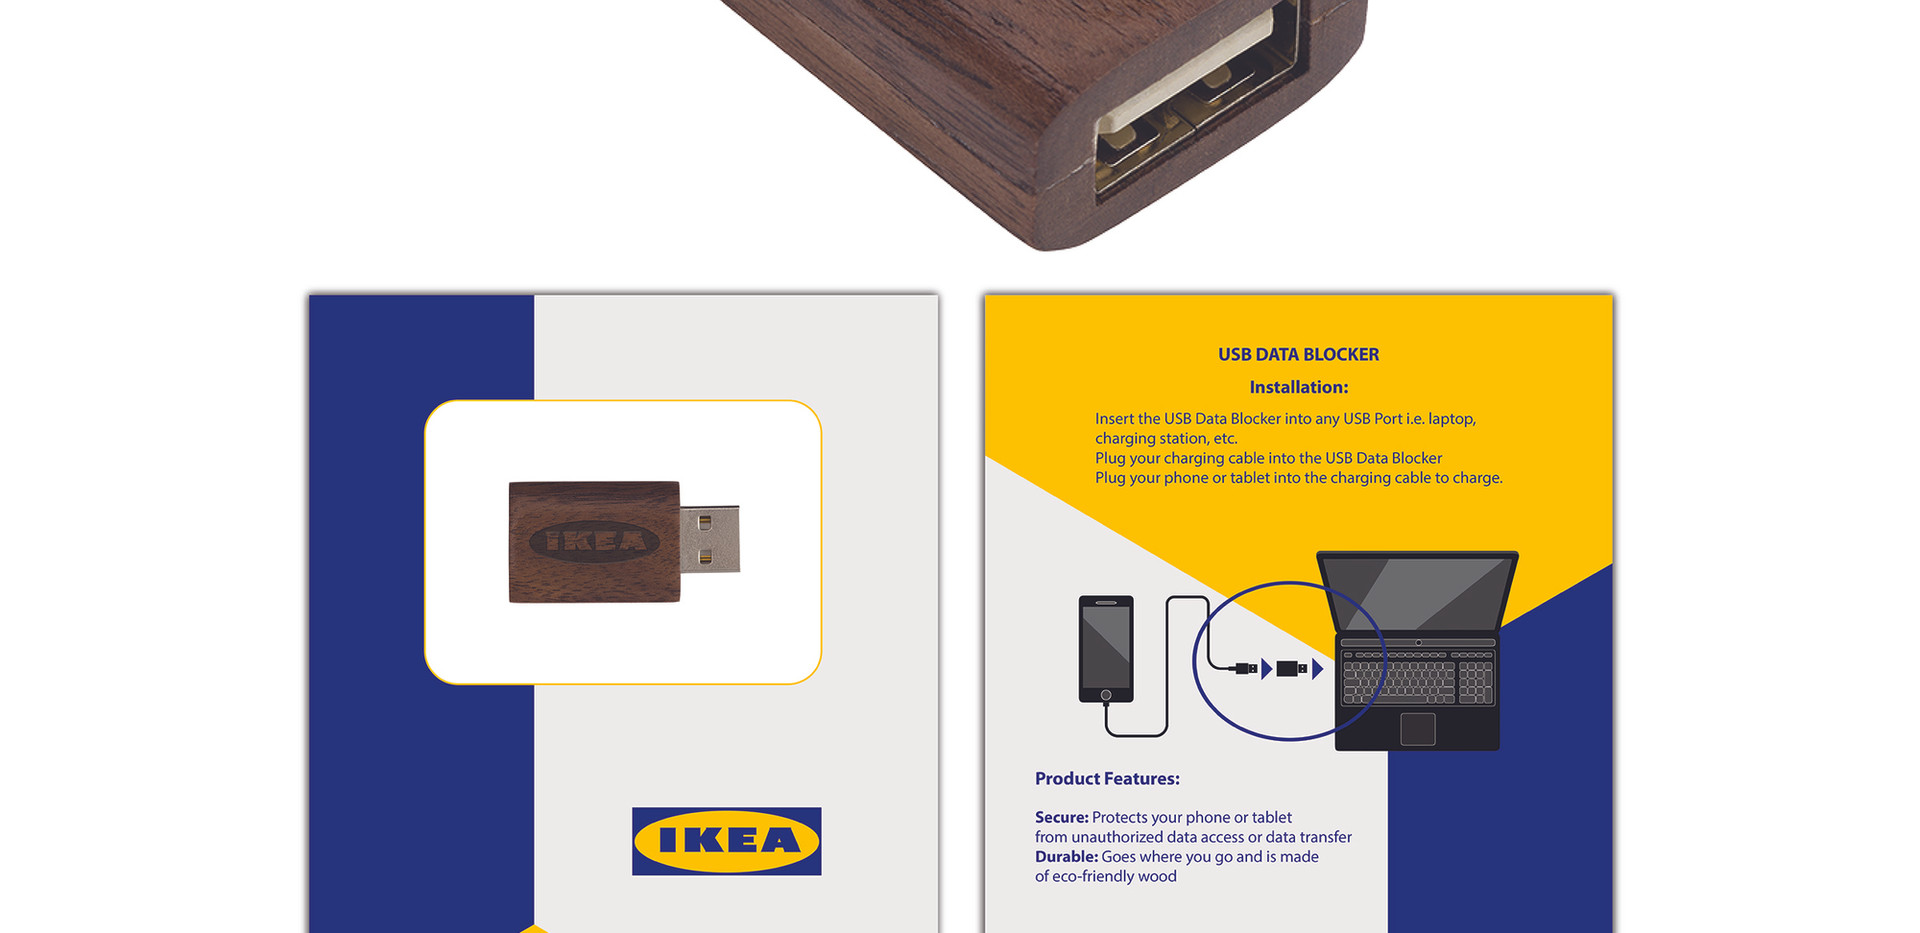 Ikea USDB Walnut Custom Card.jpg